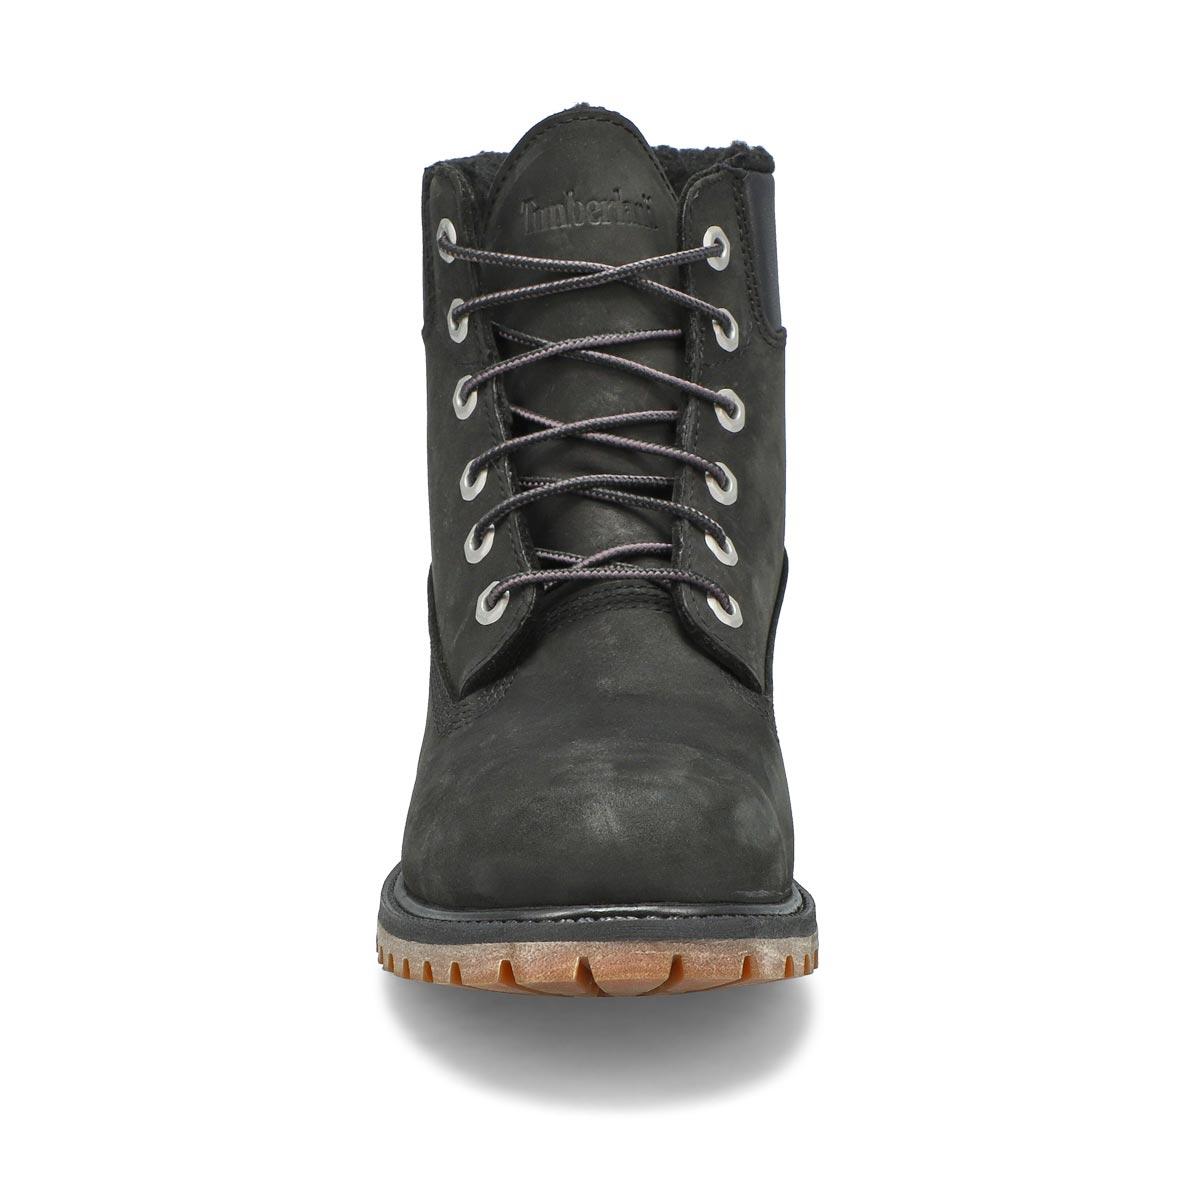 10a9b3b46a5413 Timberland | Casual Boots | SoftMoc.com